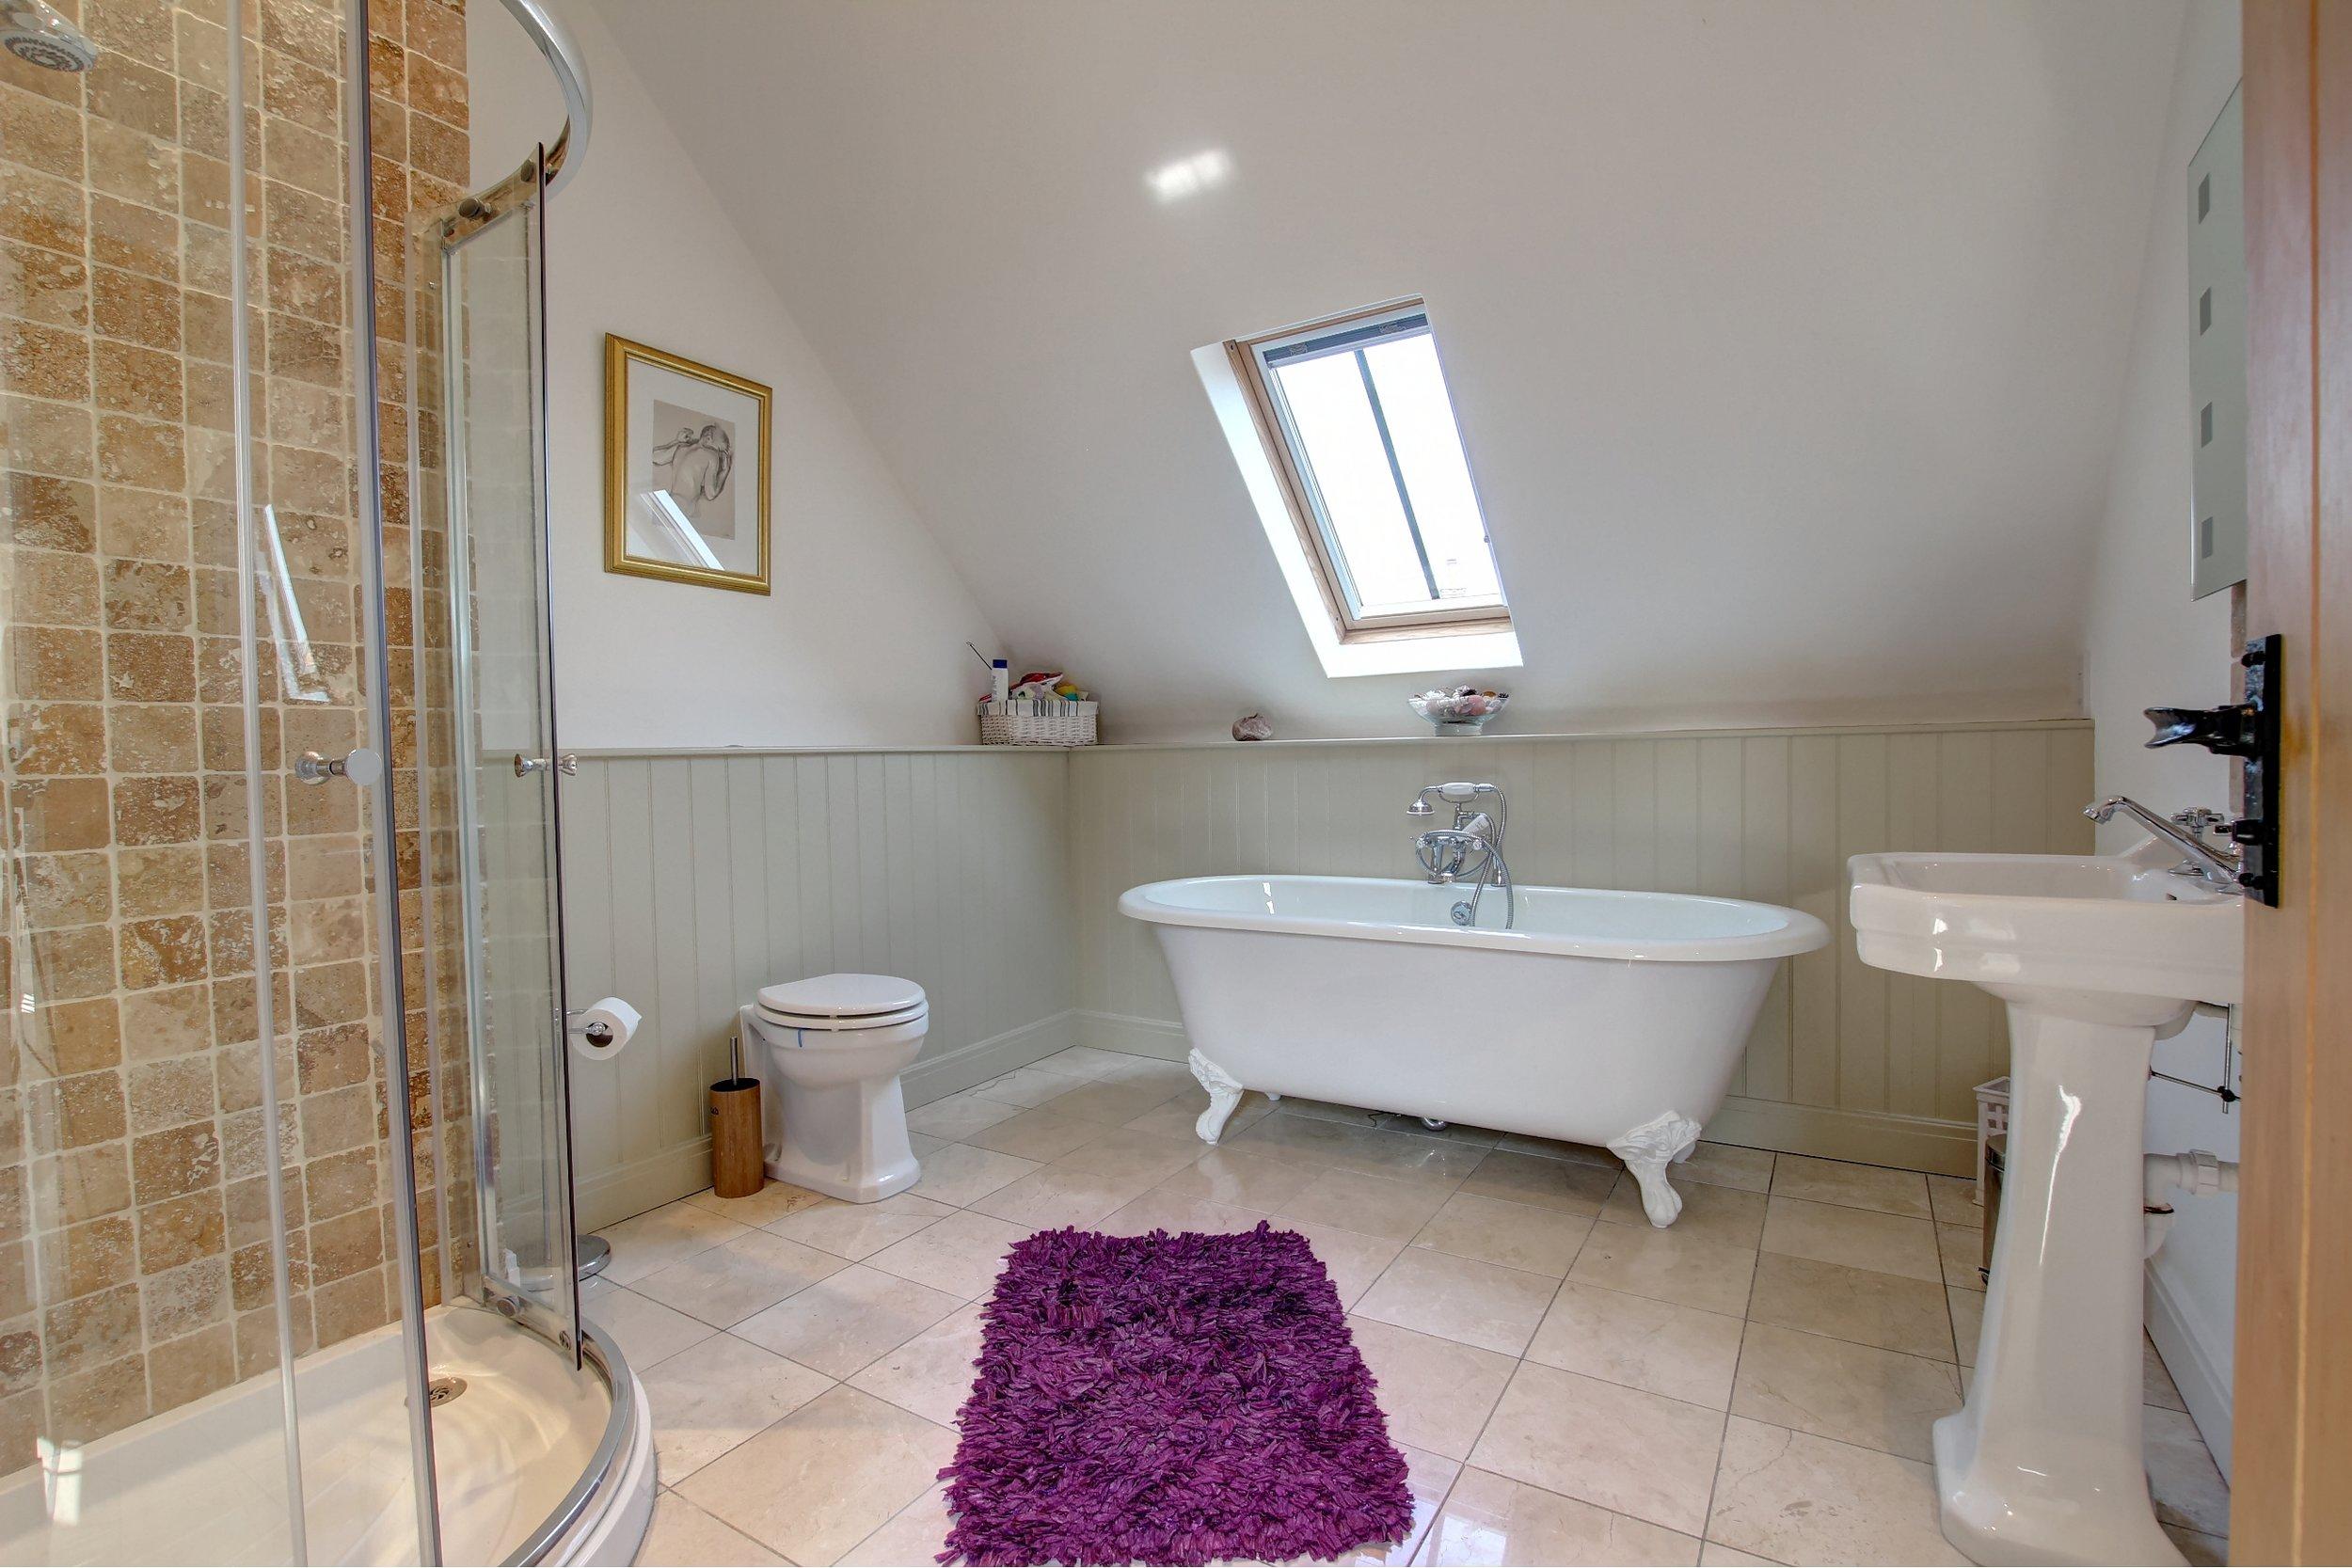 42 bathroom.jpg